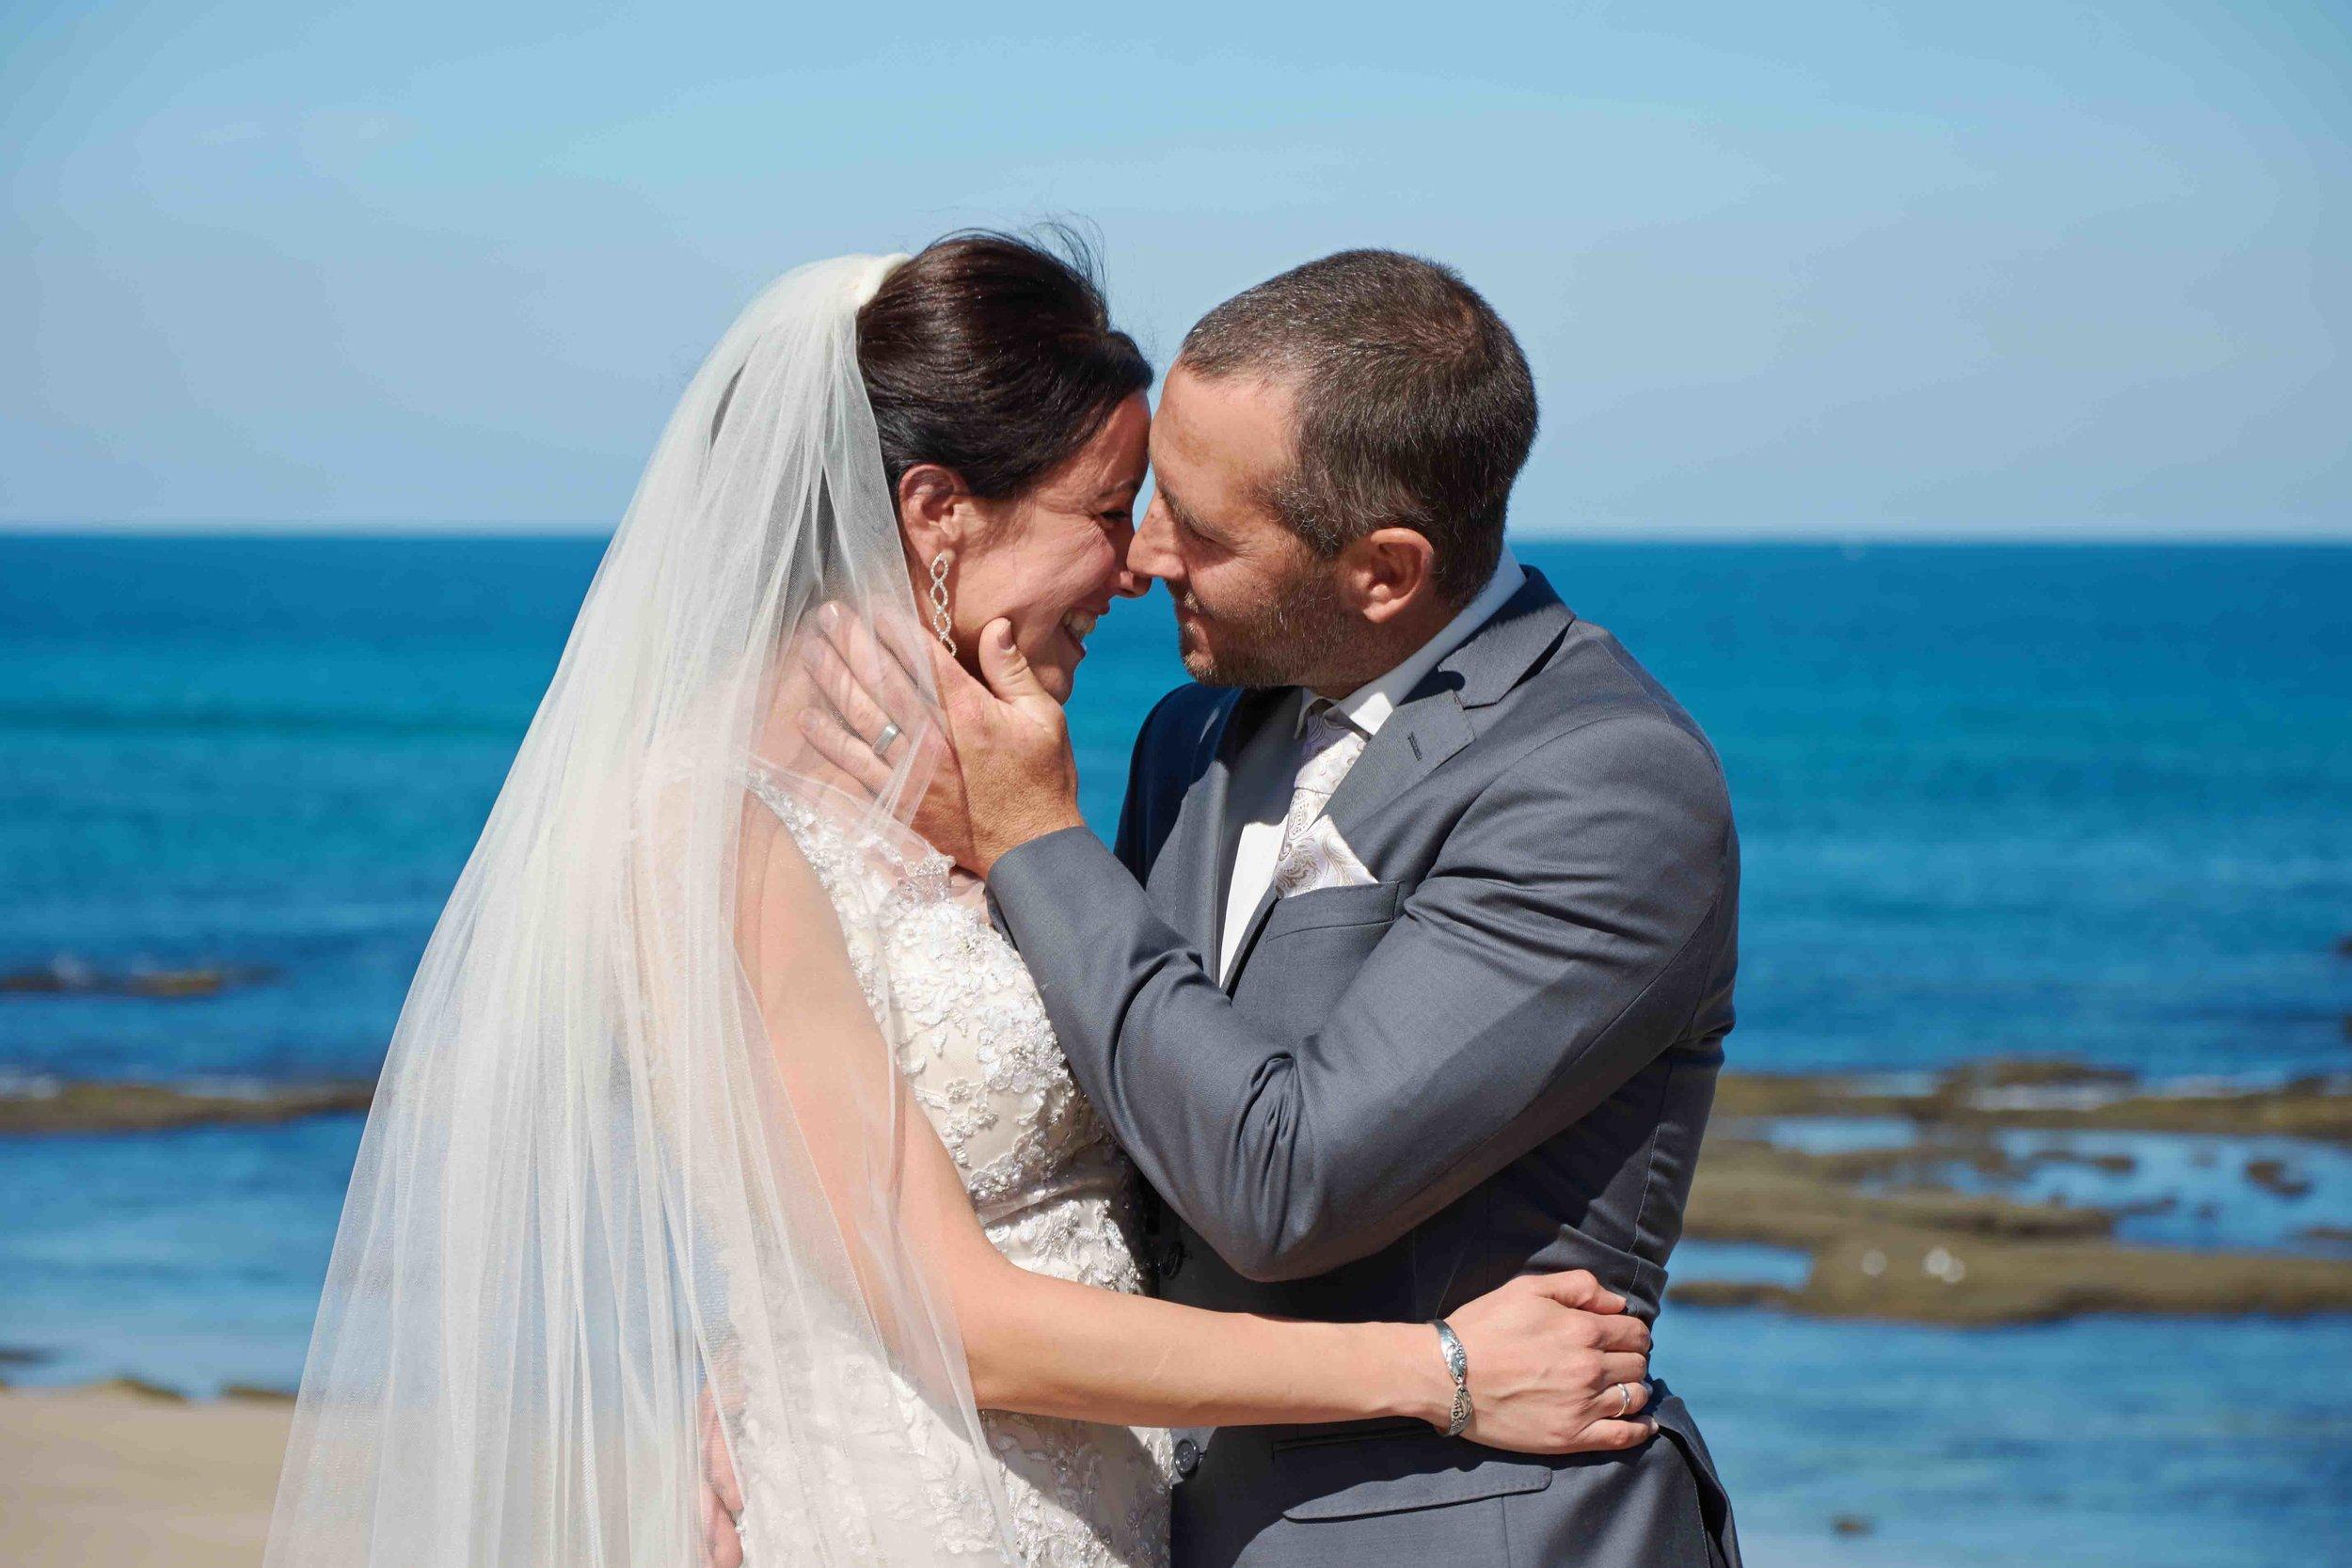 sorrento-wedding-photography-all-smiles-marissa-jade-photography-57.jpg